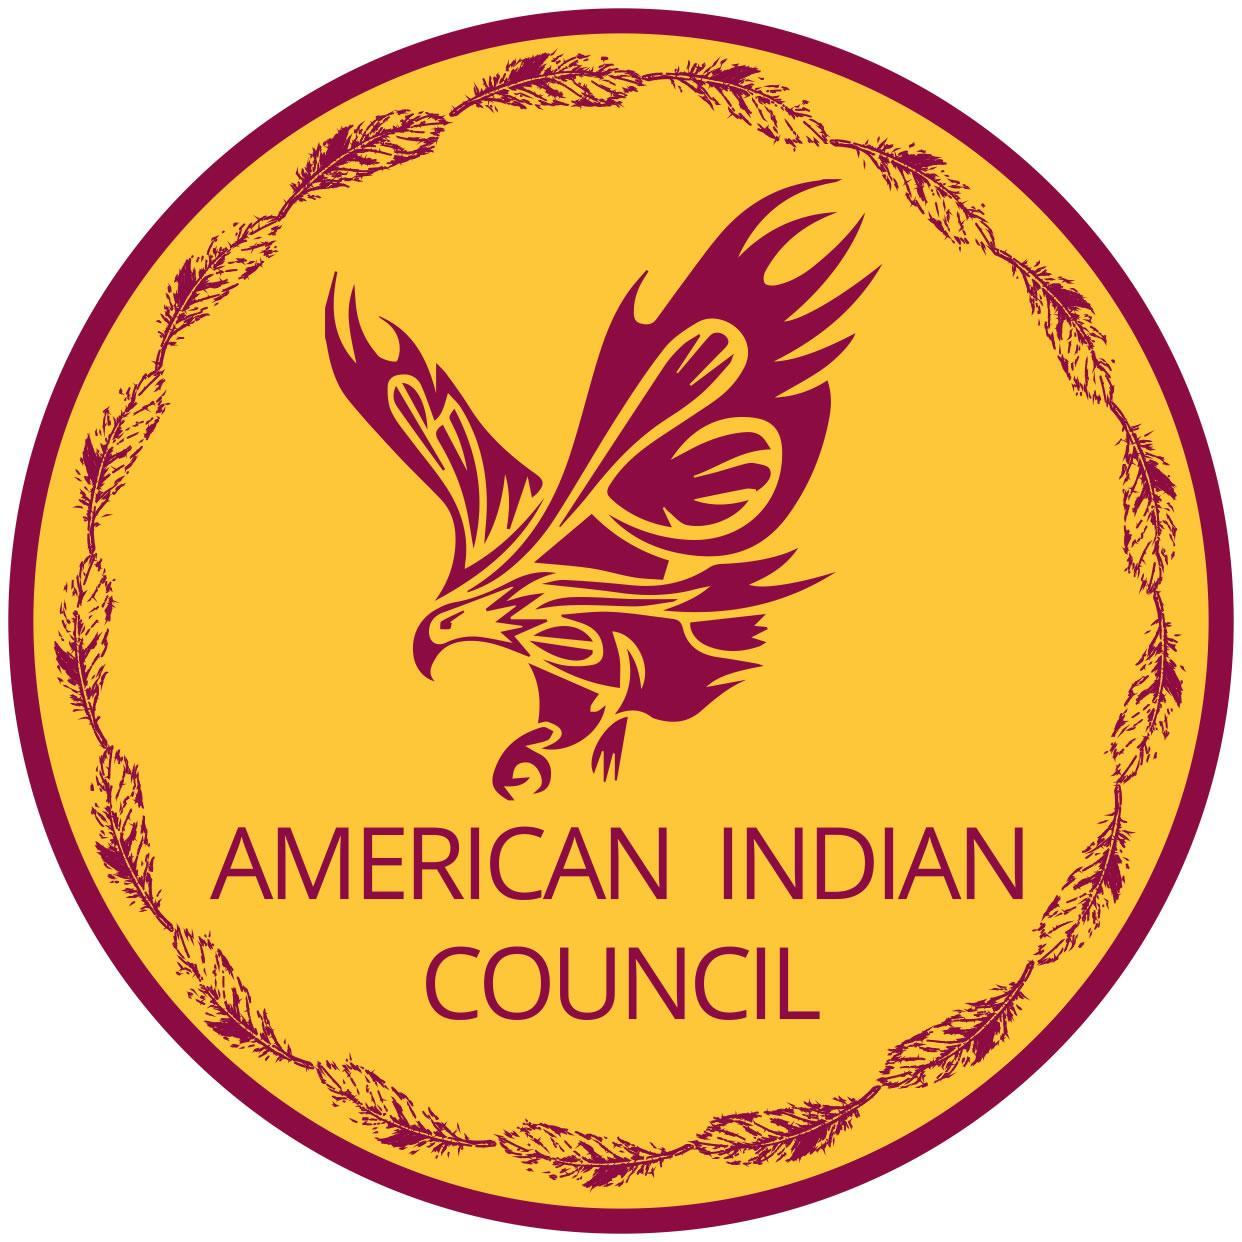 American Indian Council logo